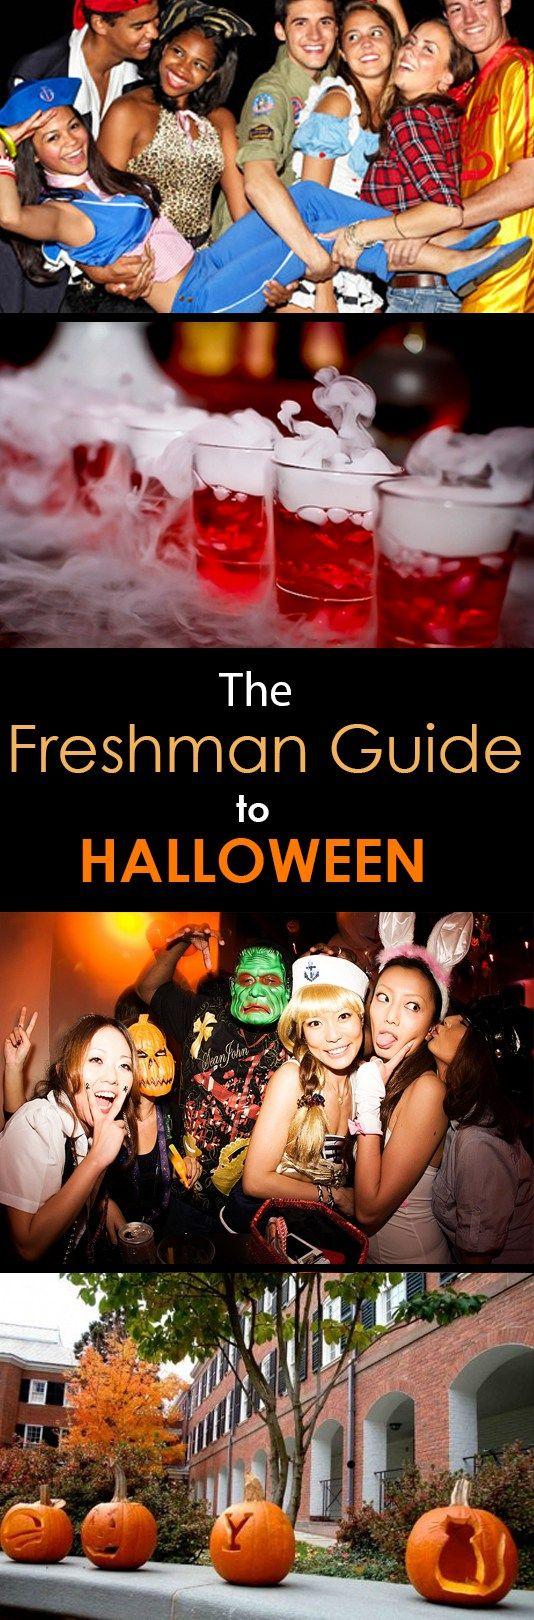 484 best [Halloween] Parties images on Pinterest